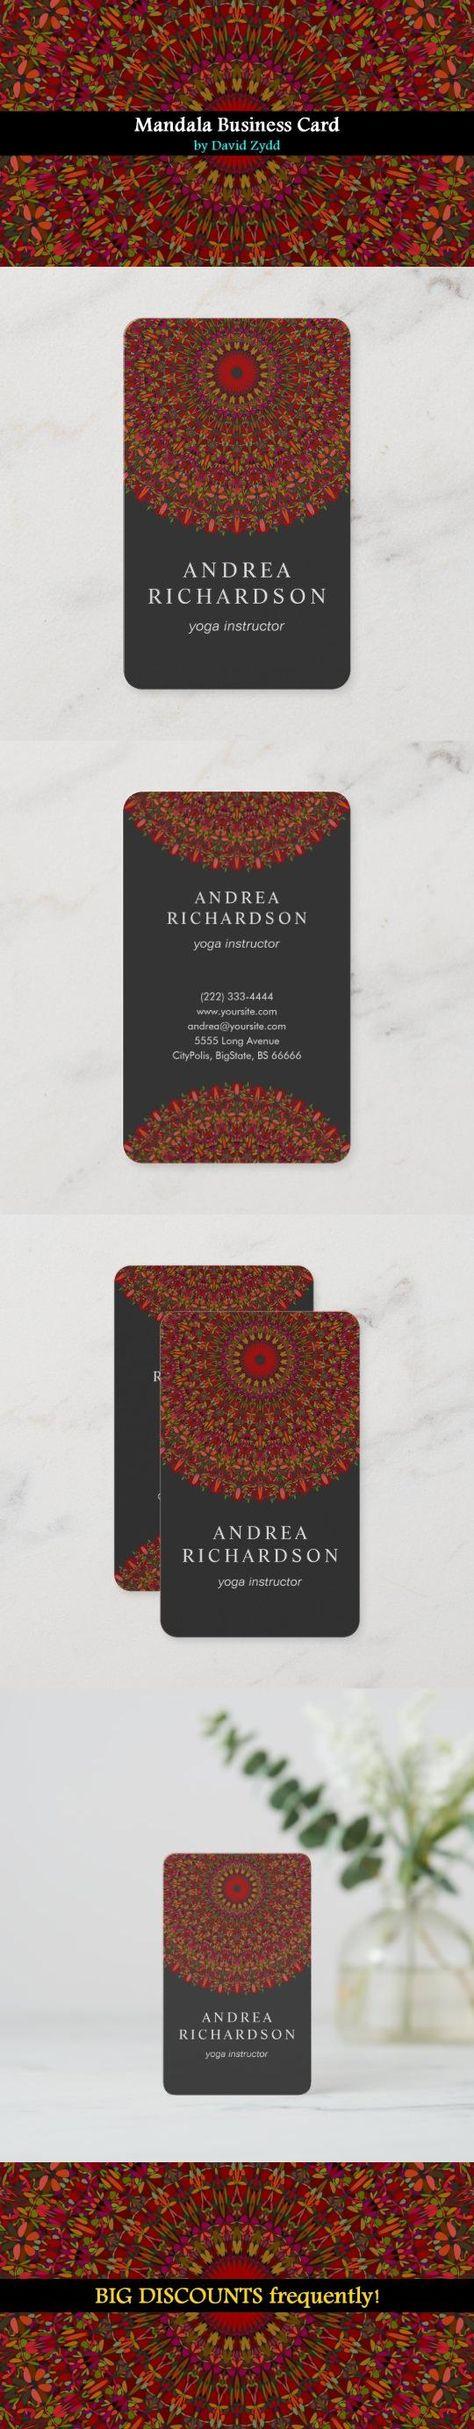 Colorful Flower Mandala Business Card | Zazzle.com